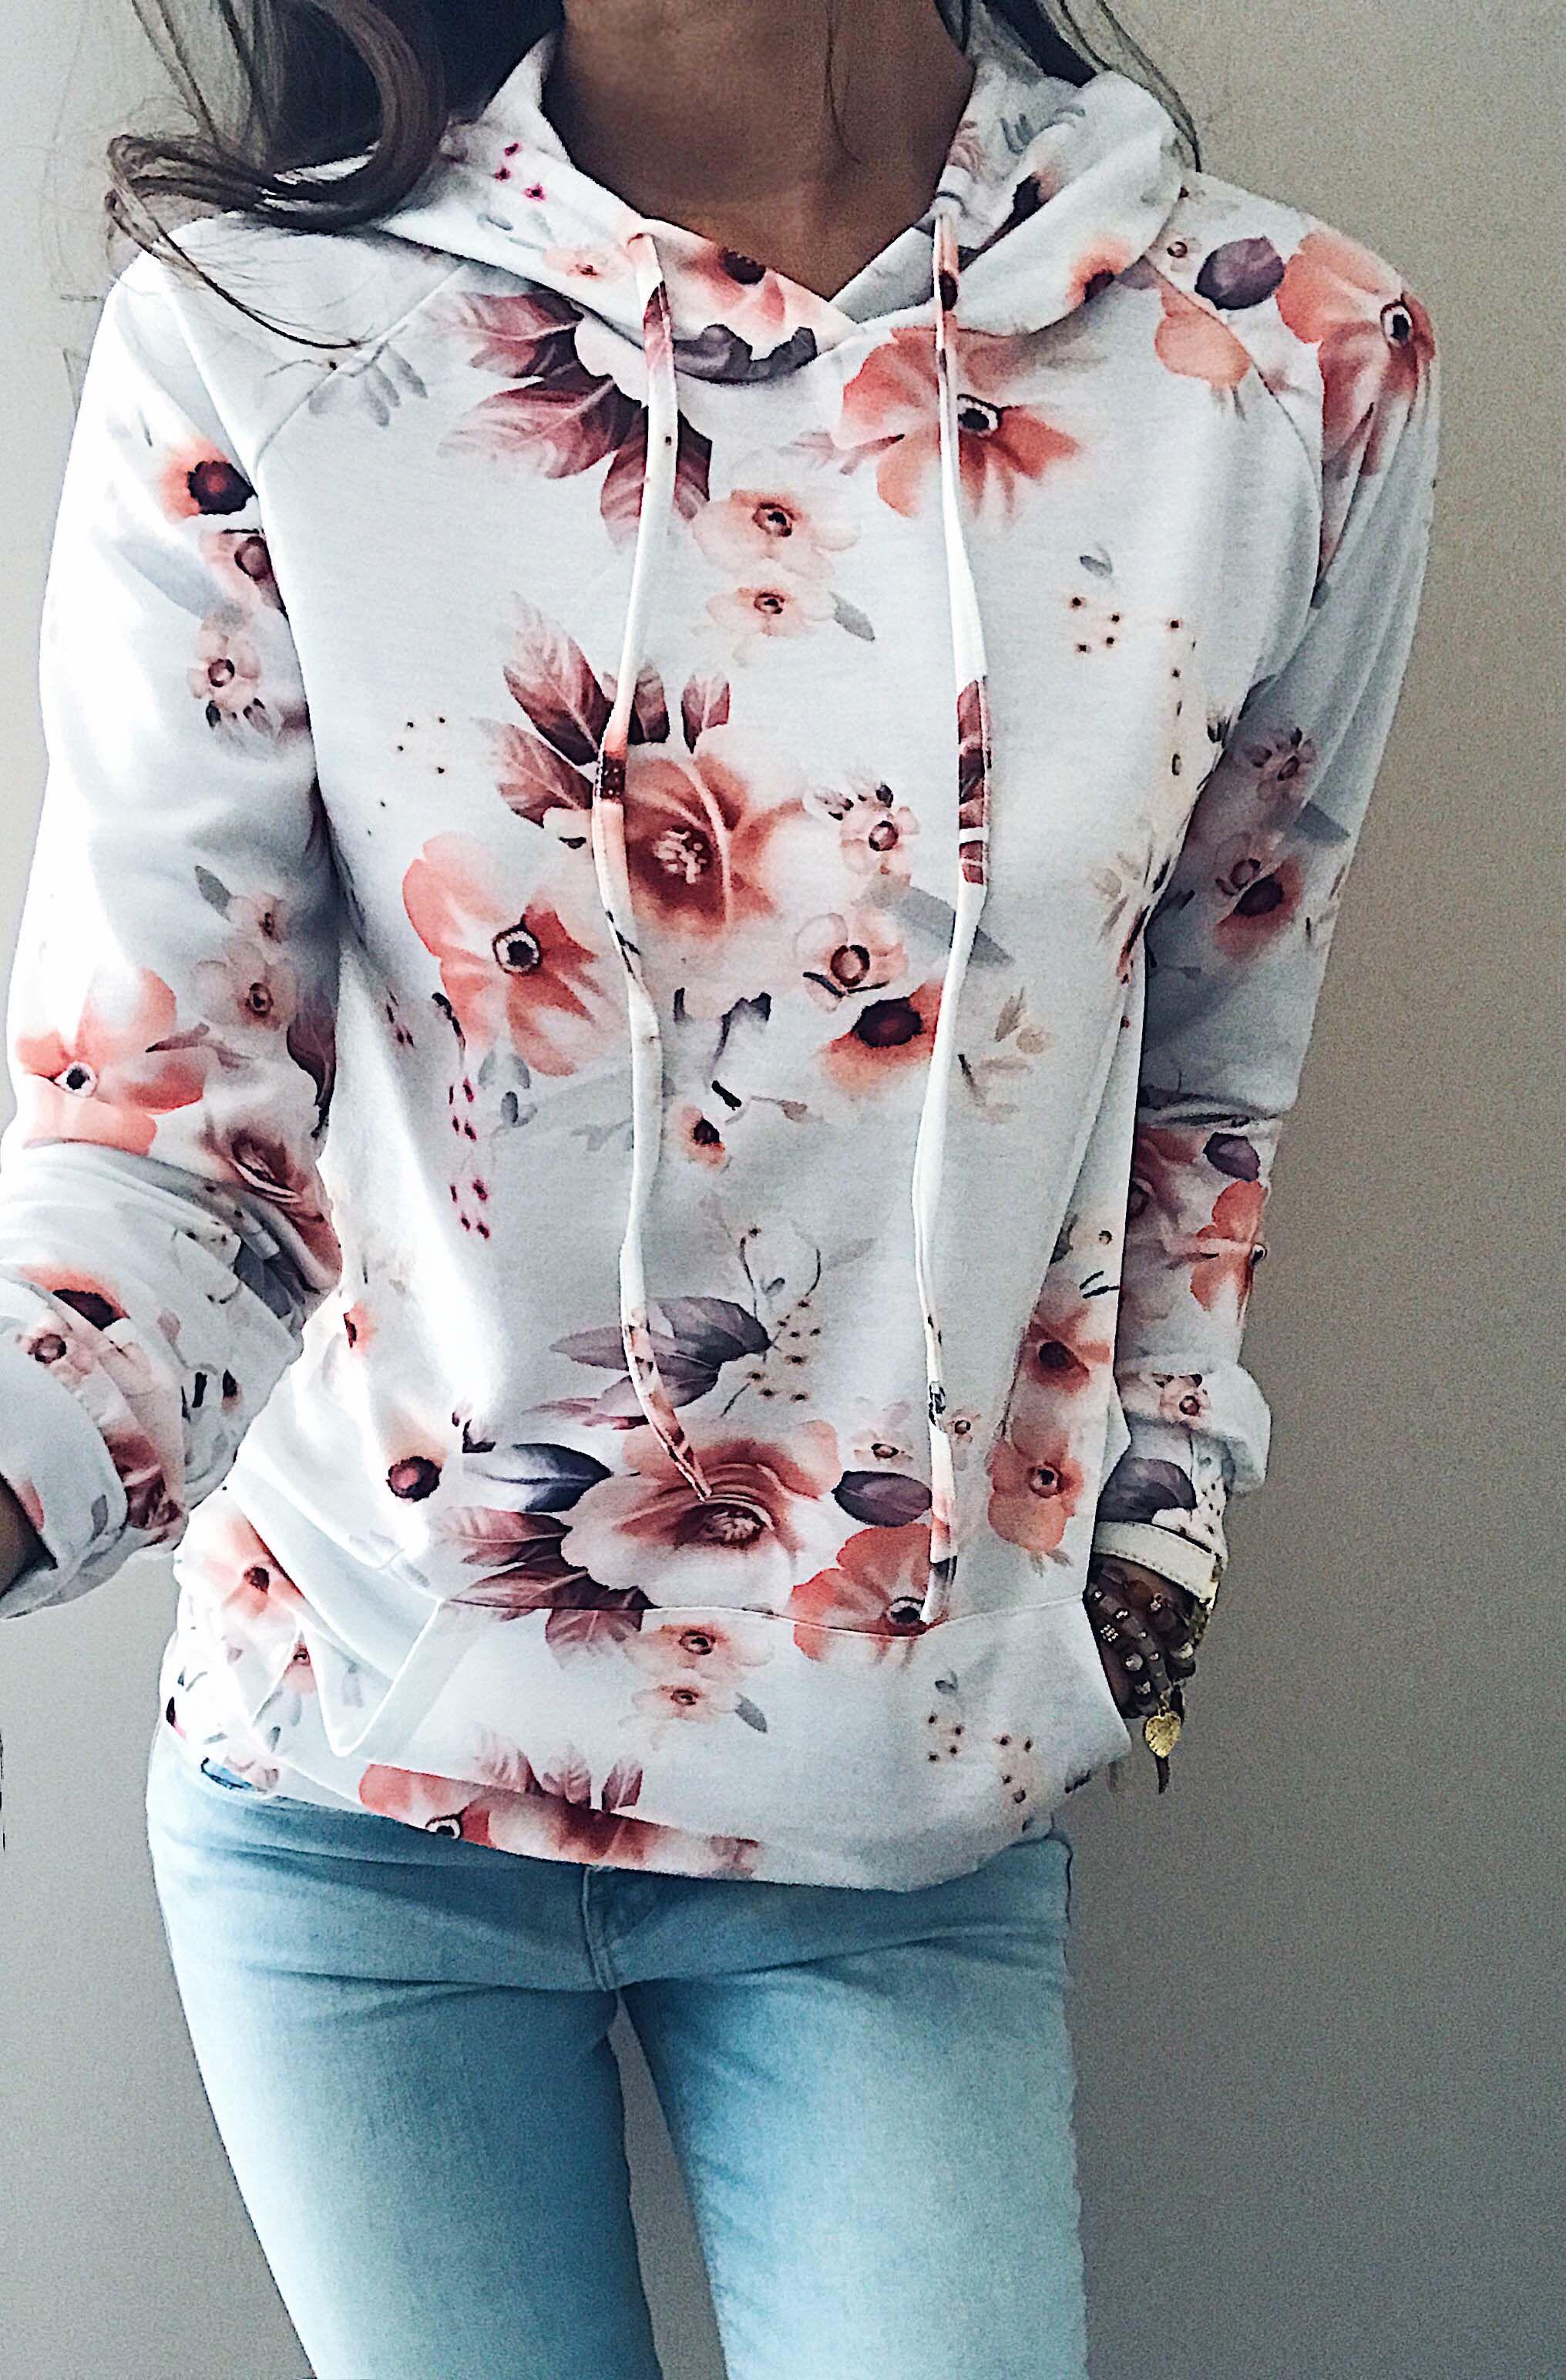 Chicnico Casual Floral Print Hoodie Long Sleeve Top. Women Fashion Casual Womens ...